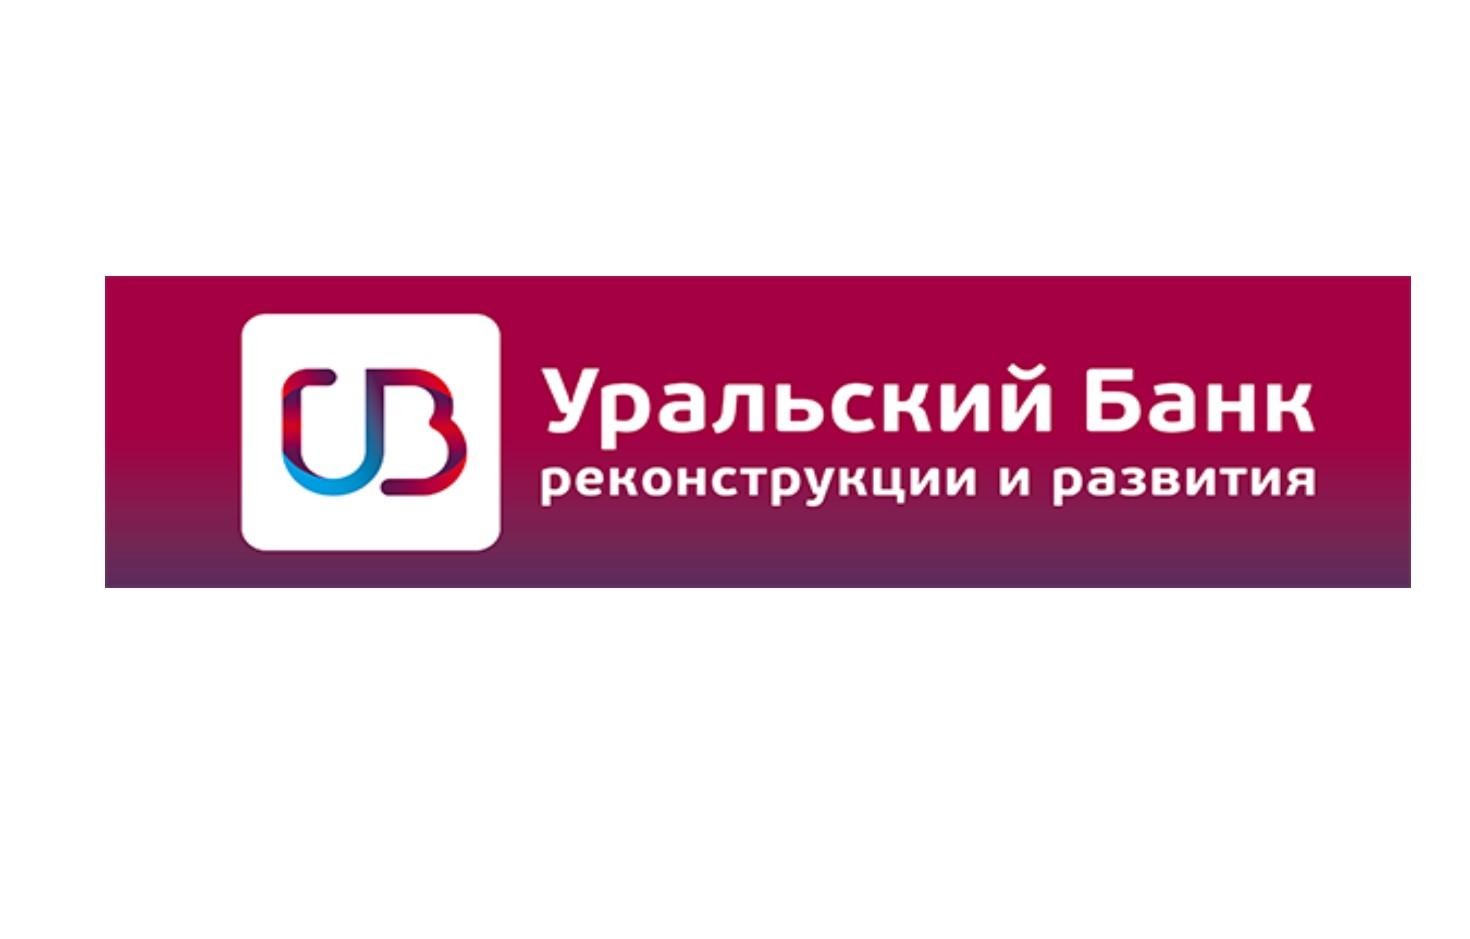 kredit-dlya-pensionerov-s-nizkoj-procentnoj-stavkoj_9